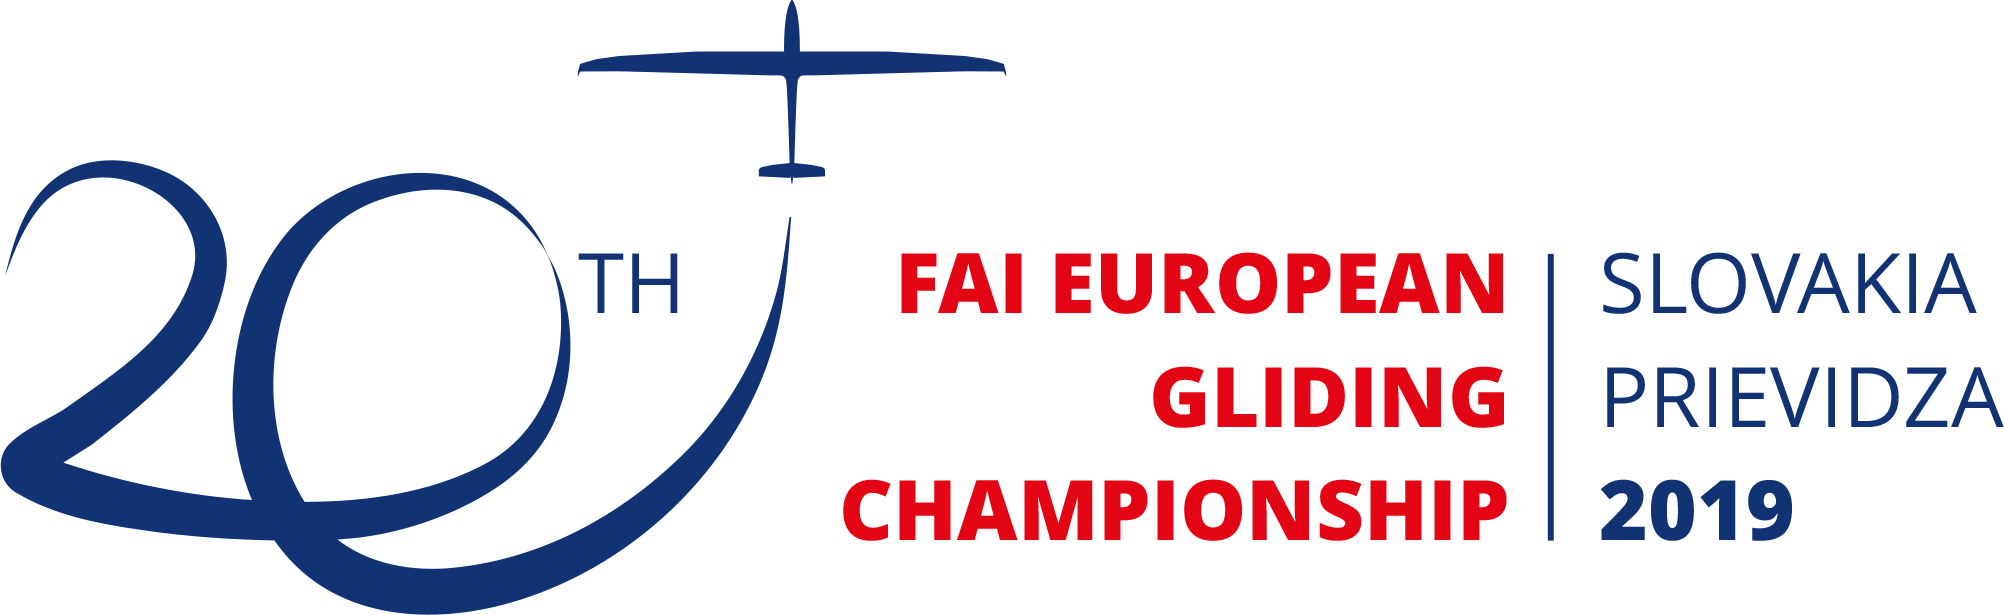 European Gliding Championship Prievidza